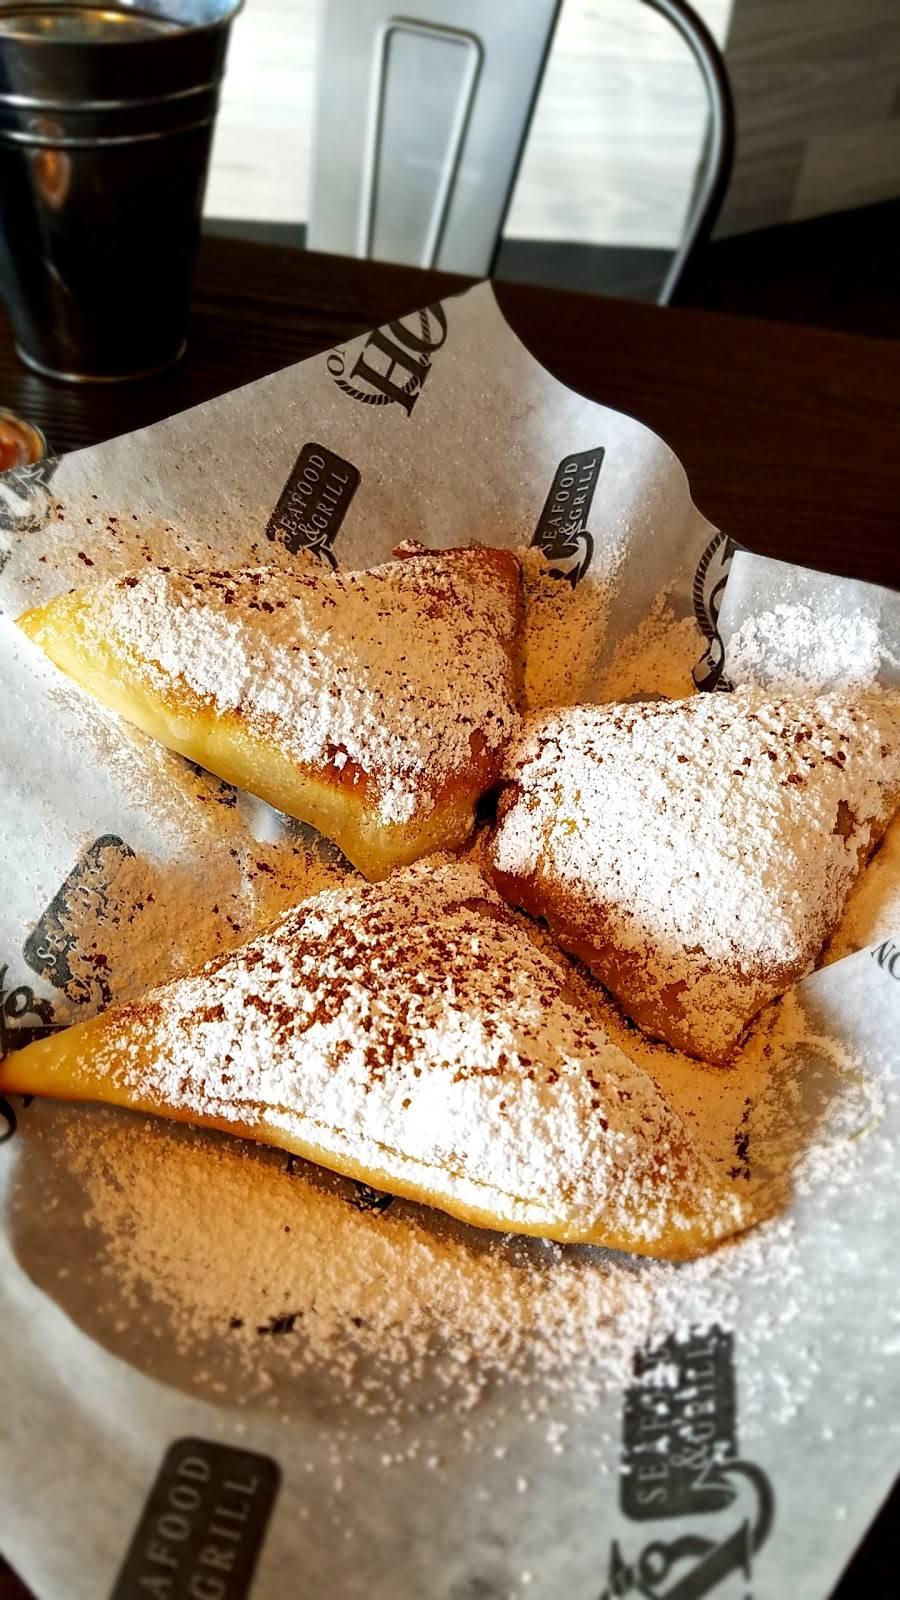 On The Hook | restaurant | 1367 W Whittier Blvd, La Habra, CA 90631, USA | 5626407827 OR +1 562-640-7827